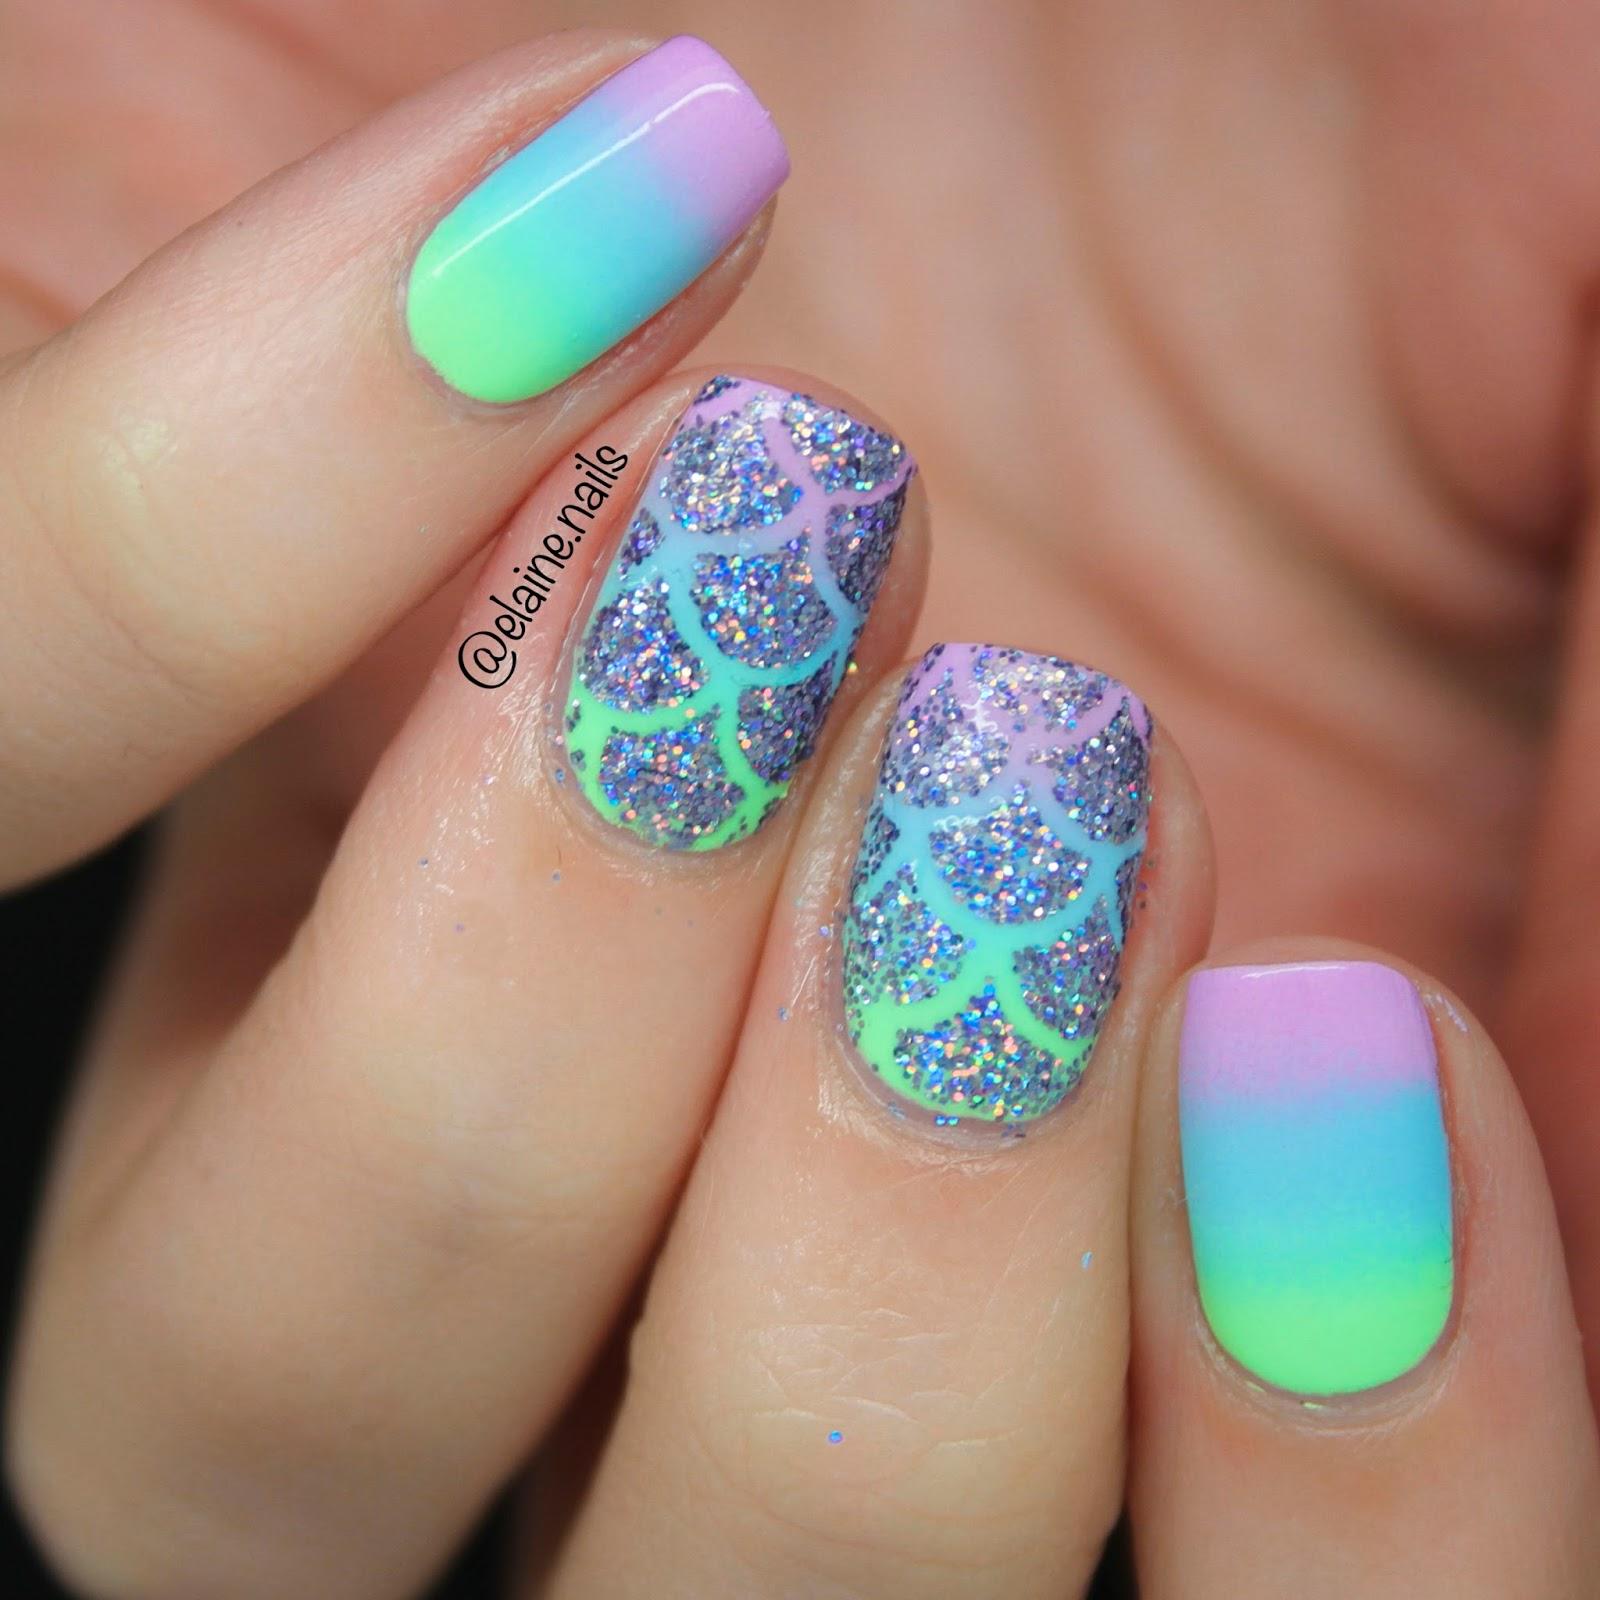 Elaine Nails: Pastel Neon Mermaid Scale Nail Art